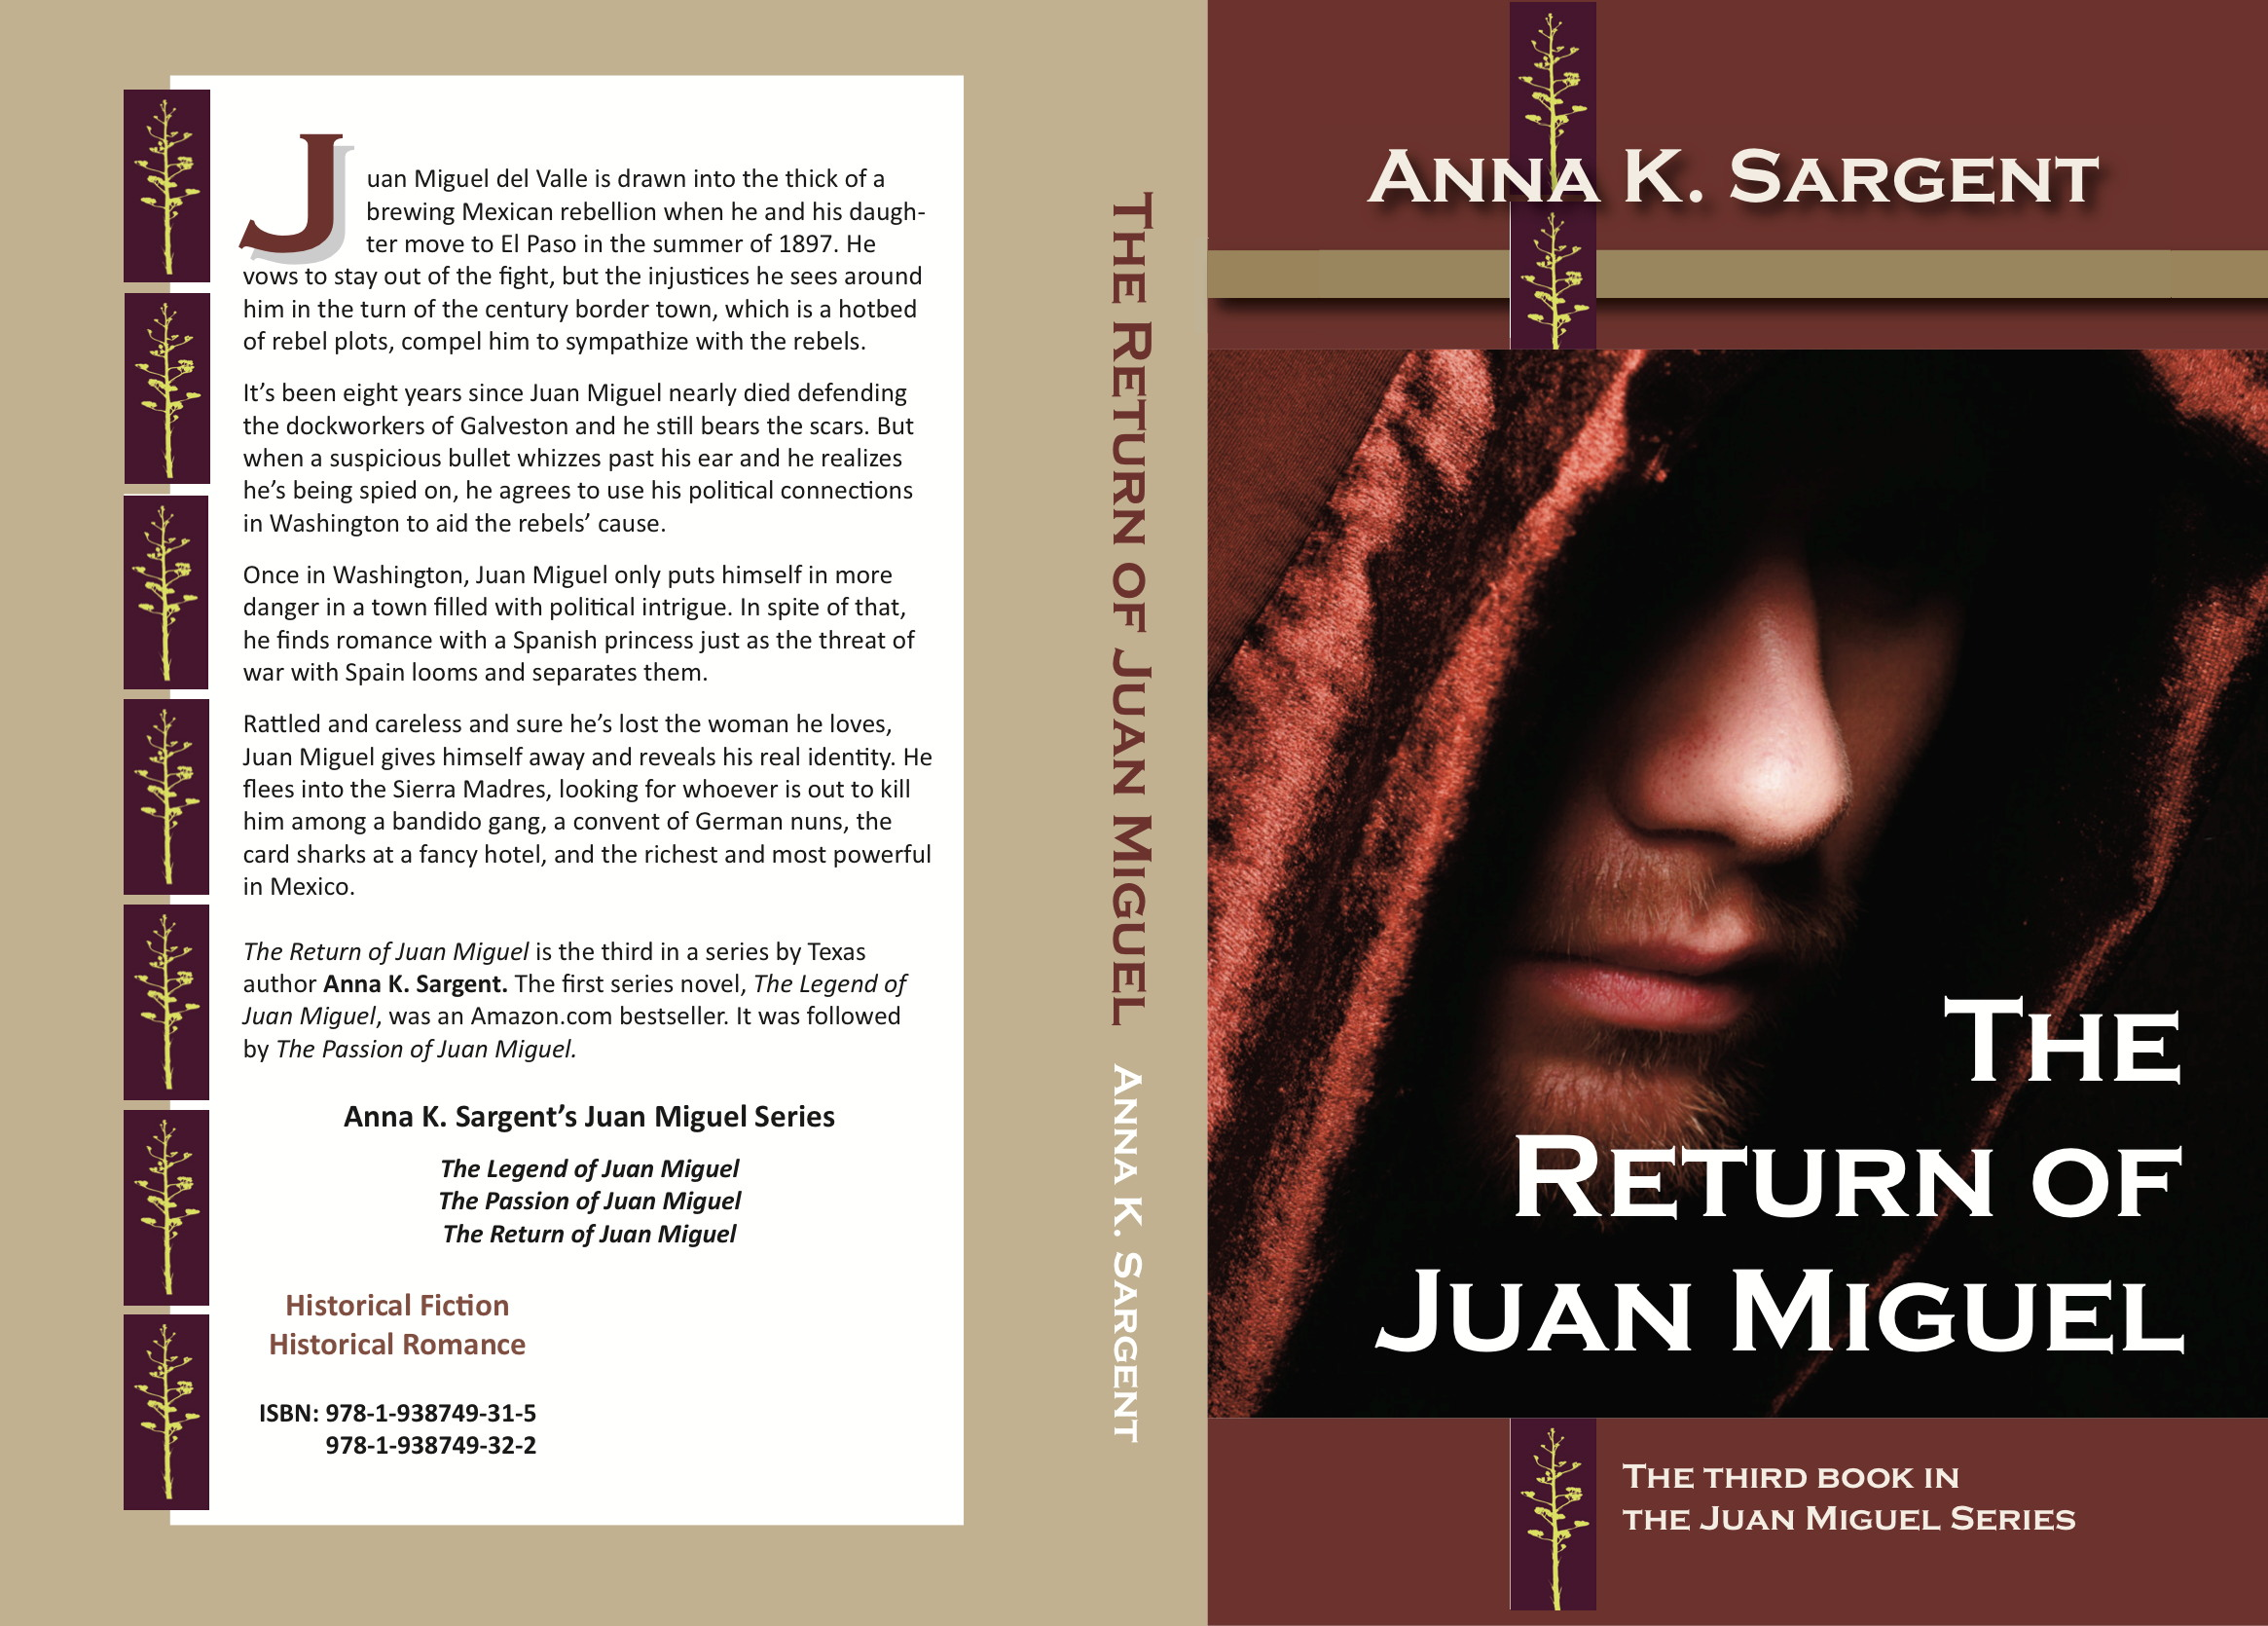 The Return of Juan Miguel